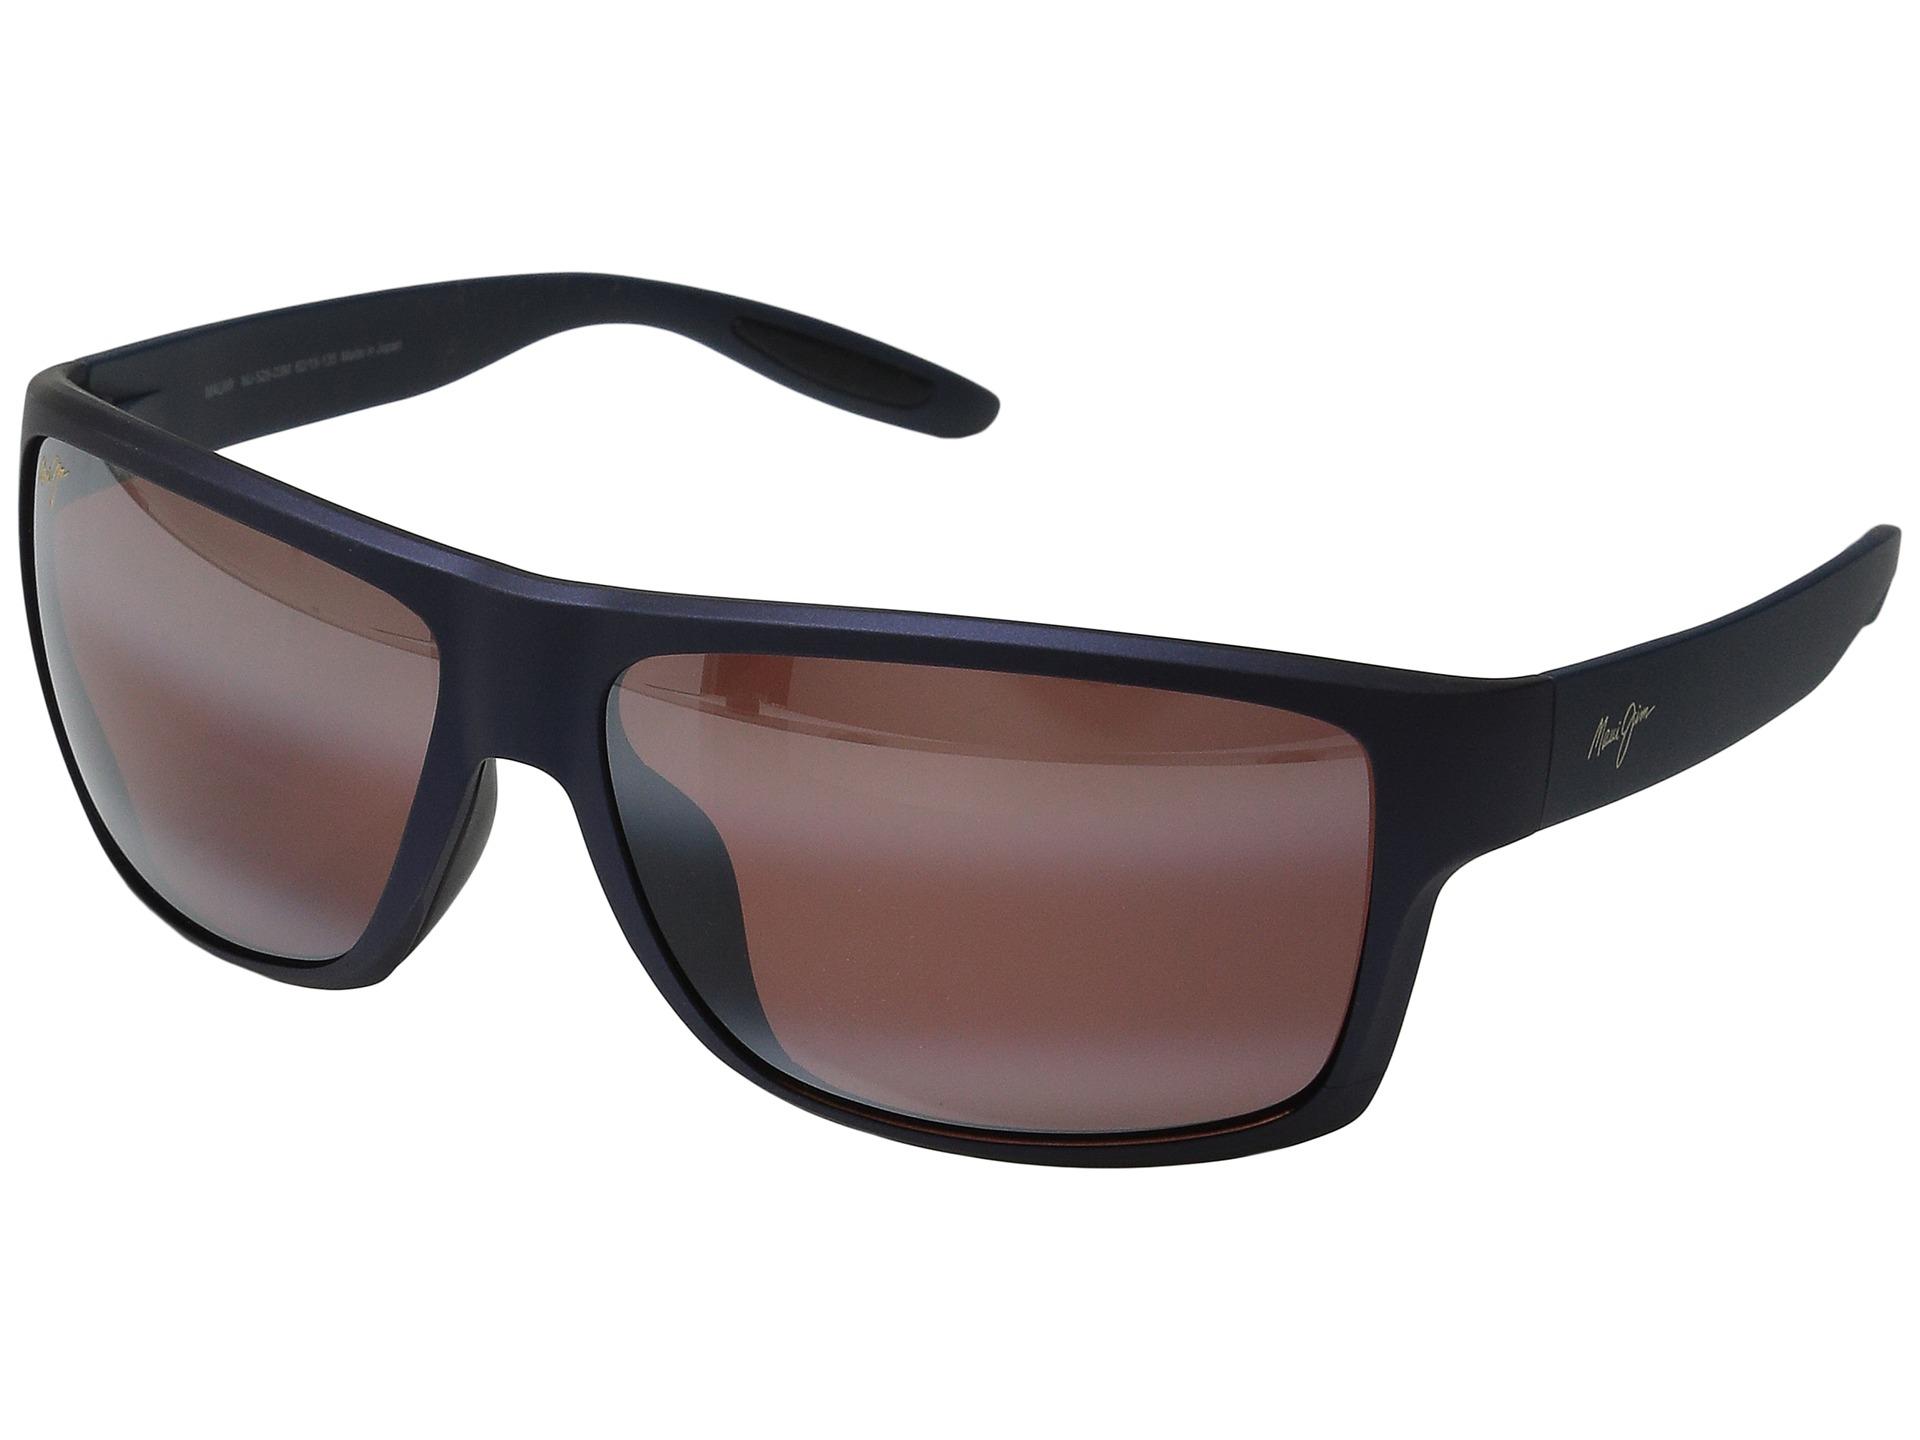 Maui Jim Sunglasses Warranty  do maui jim sunglasses have a lifetime warranty the cotswolds awards